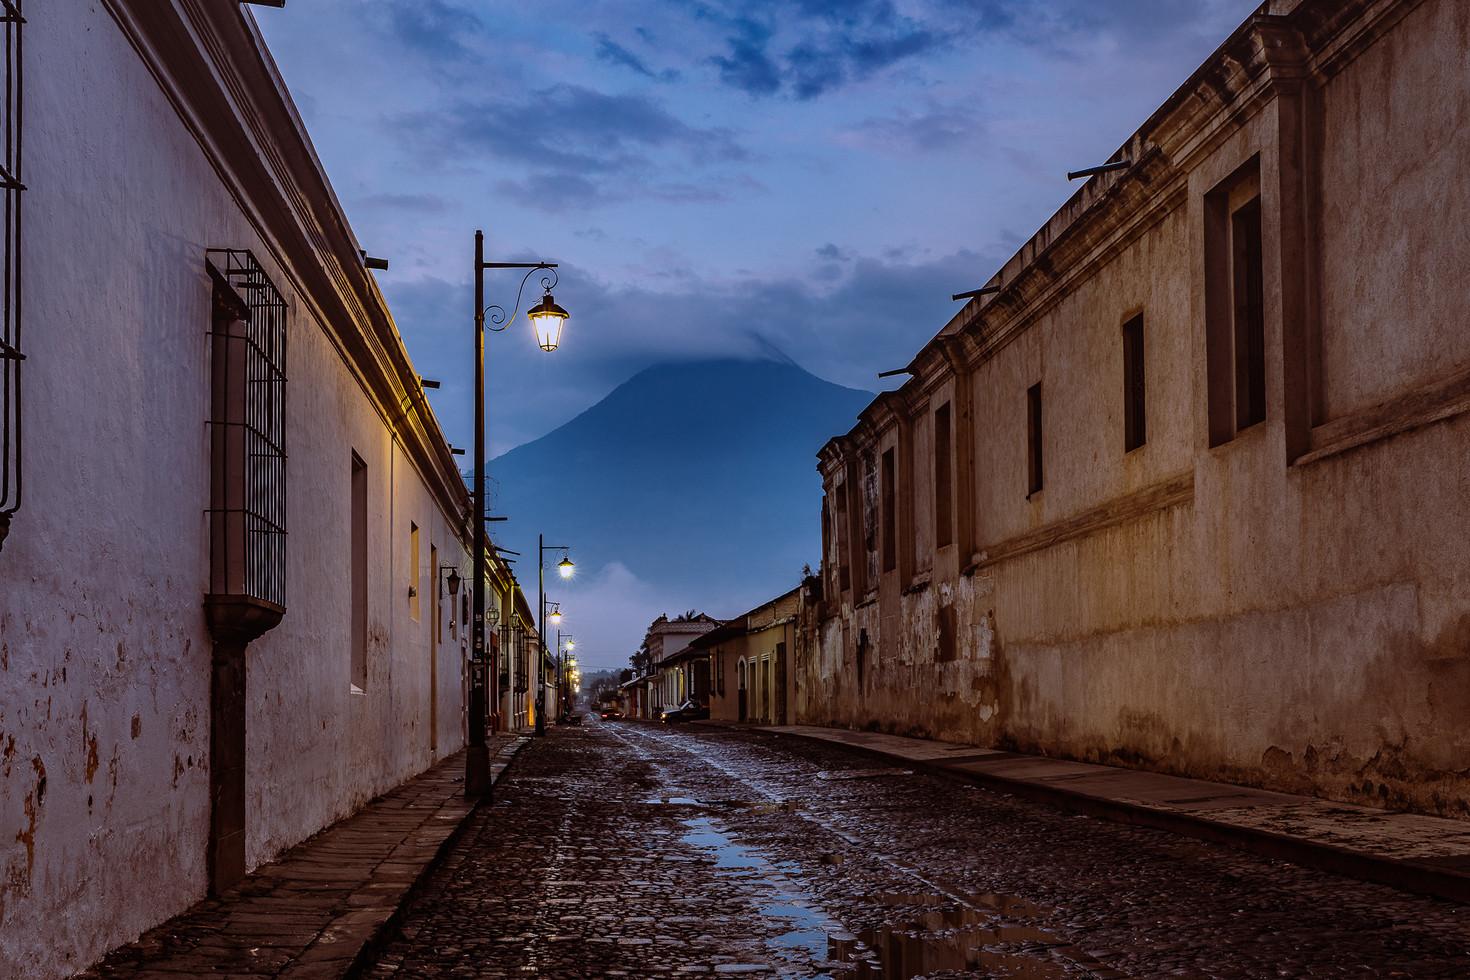 TKPA-Antigua201805-0003-HDWH.jpg